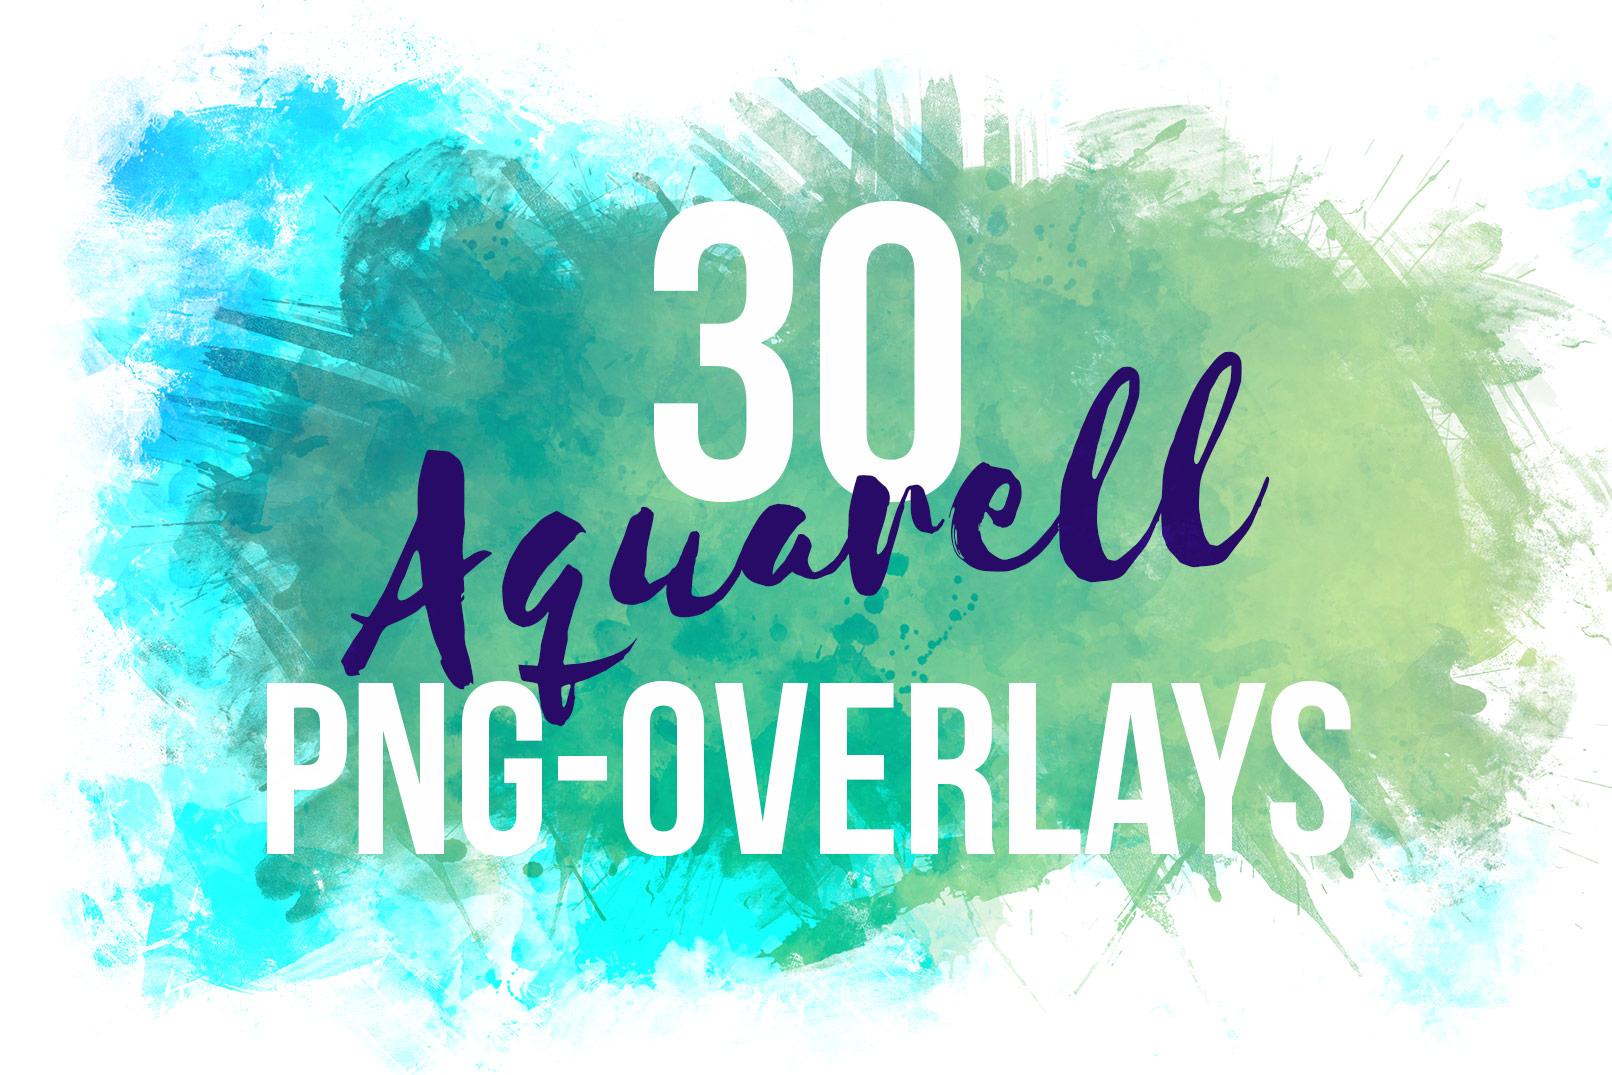 Schriftzug mit Aquarell-Rahmen